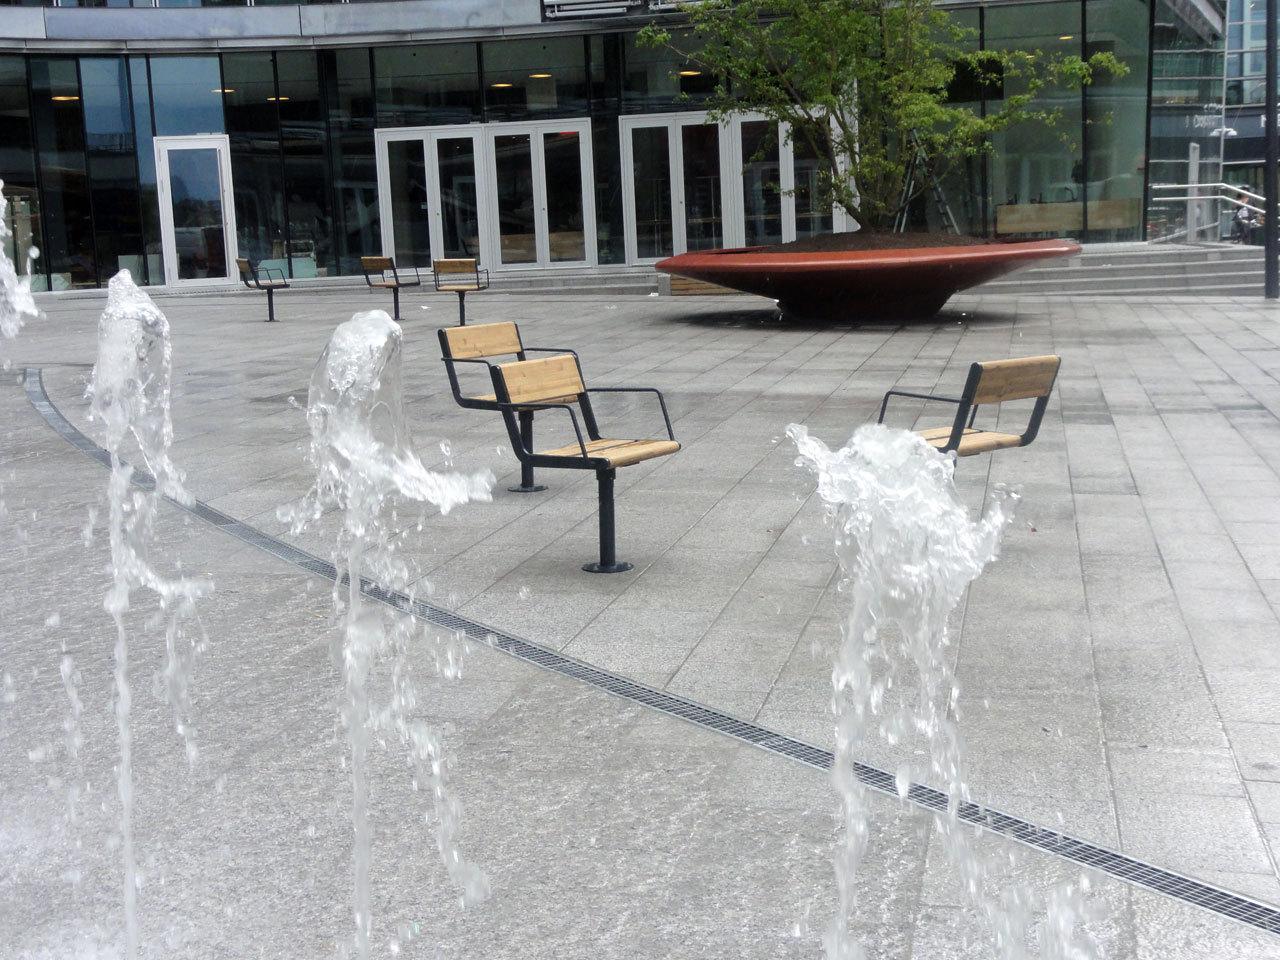 Gallery Of Lorenskog Central Square Ostengen Bergo AS